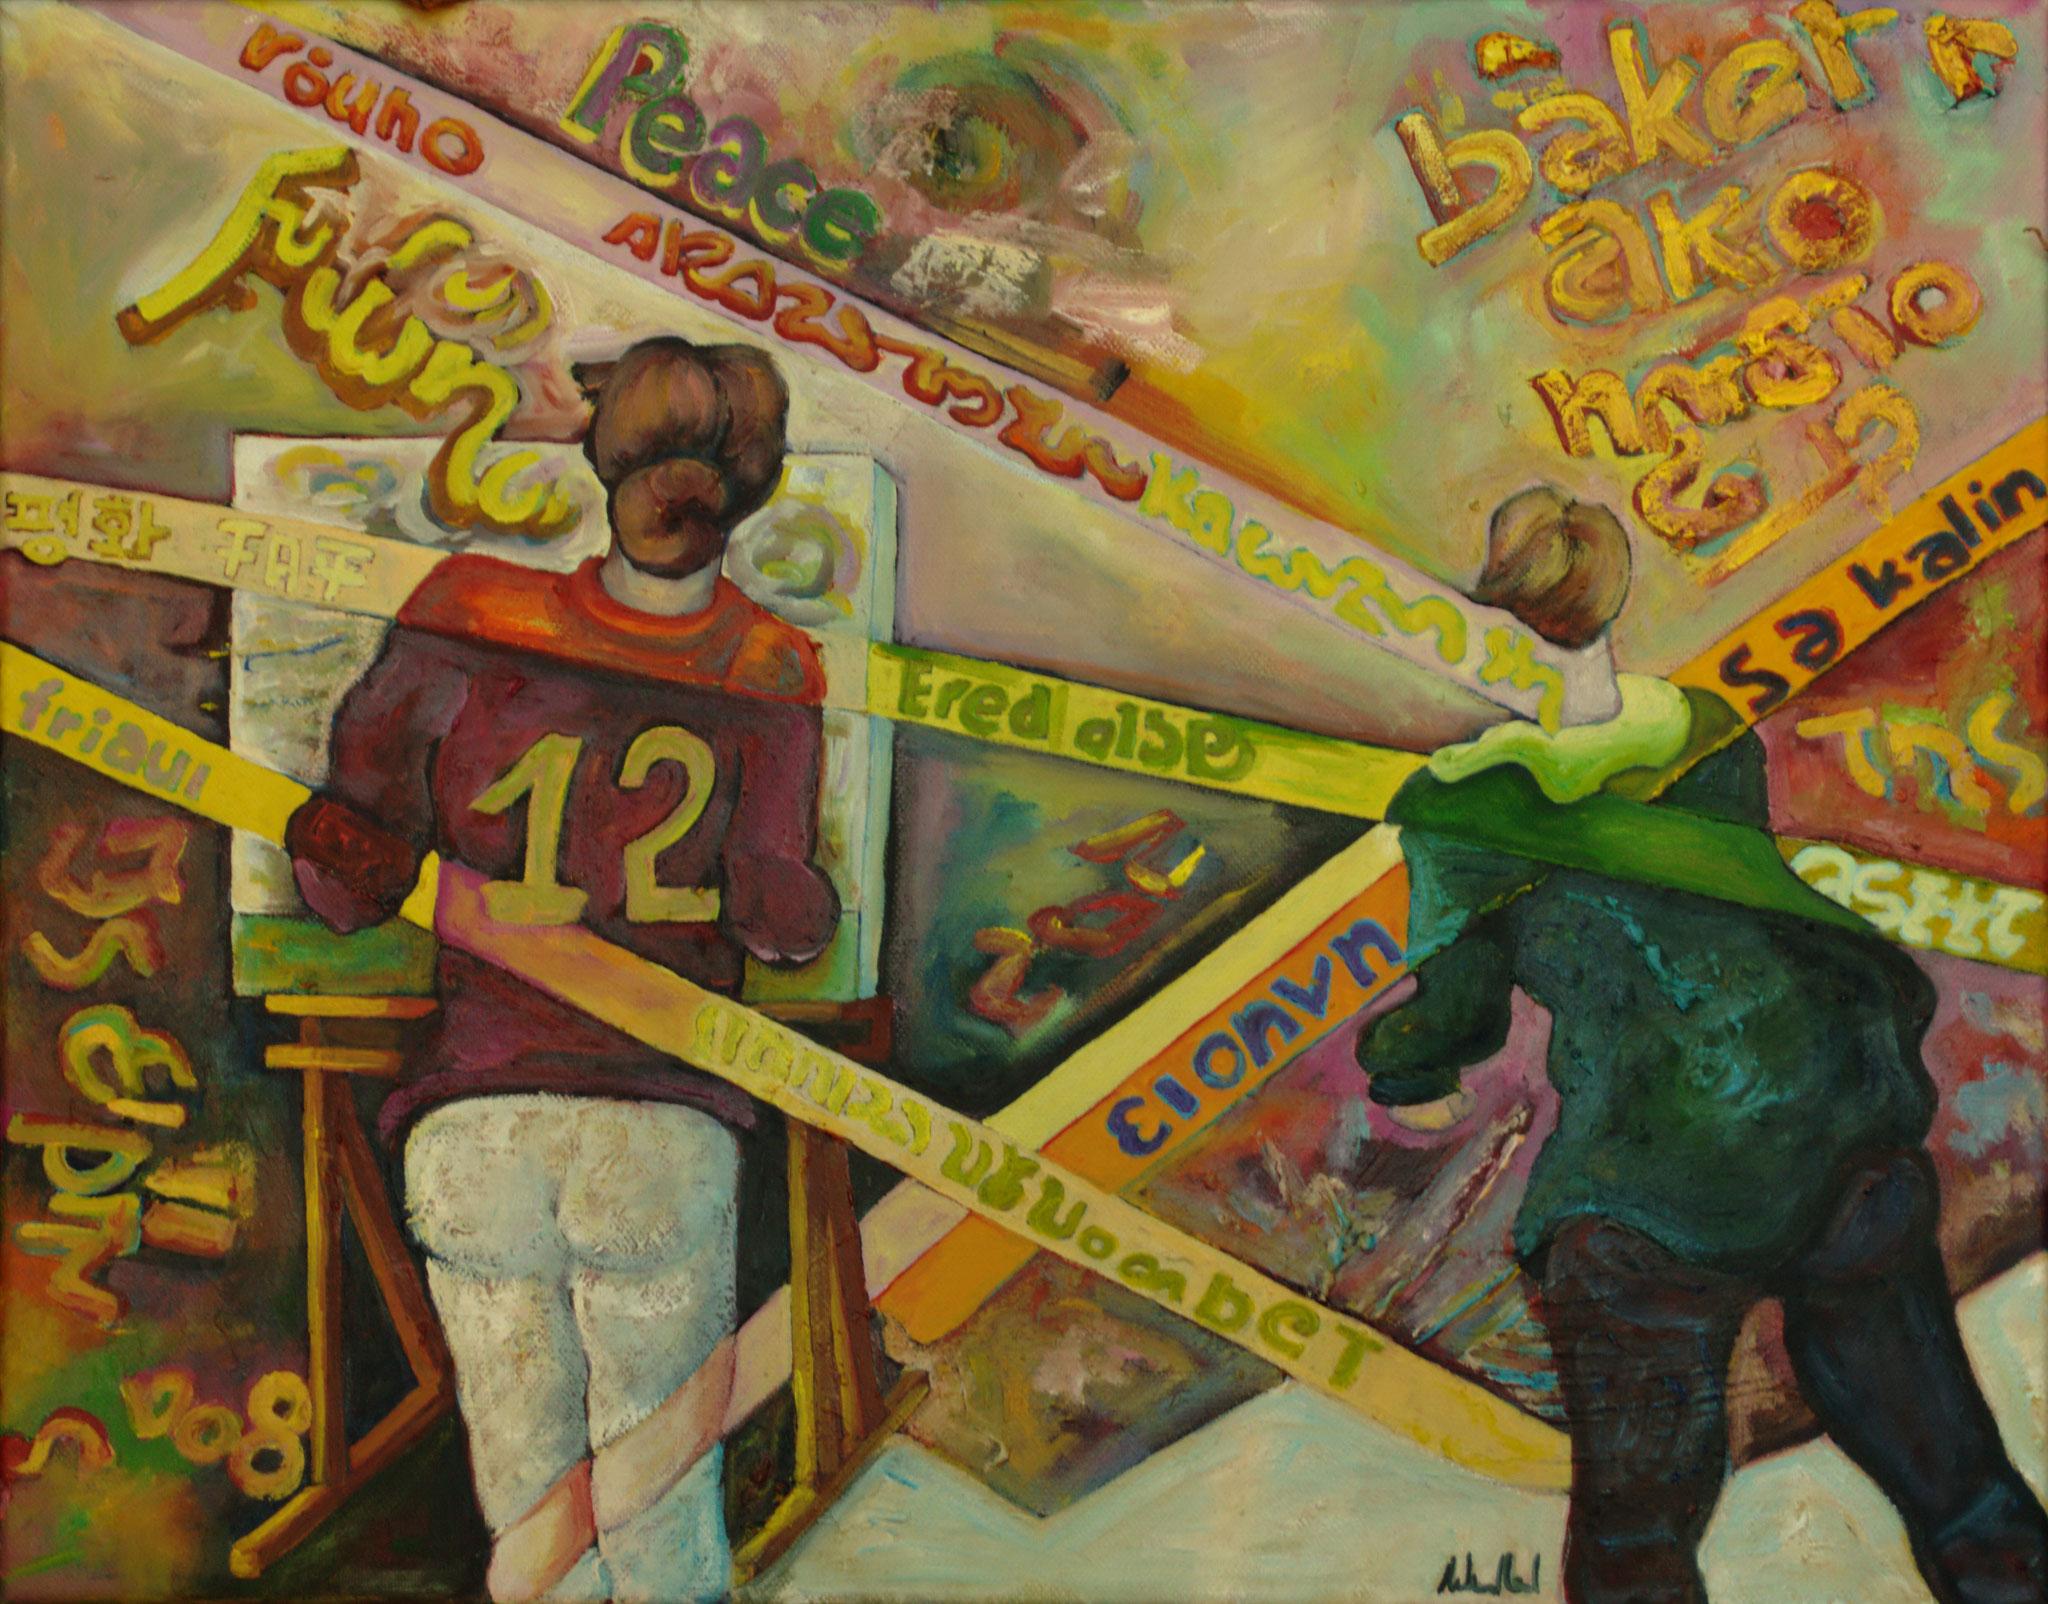 Frieden gemalt · 2017 · Acryl, Öl auf Nessel, 40 x 50 cm